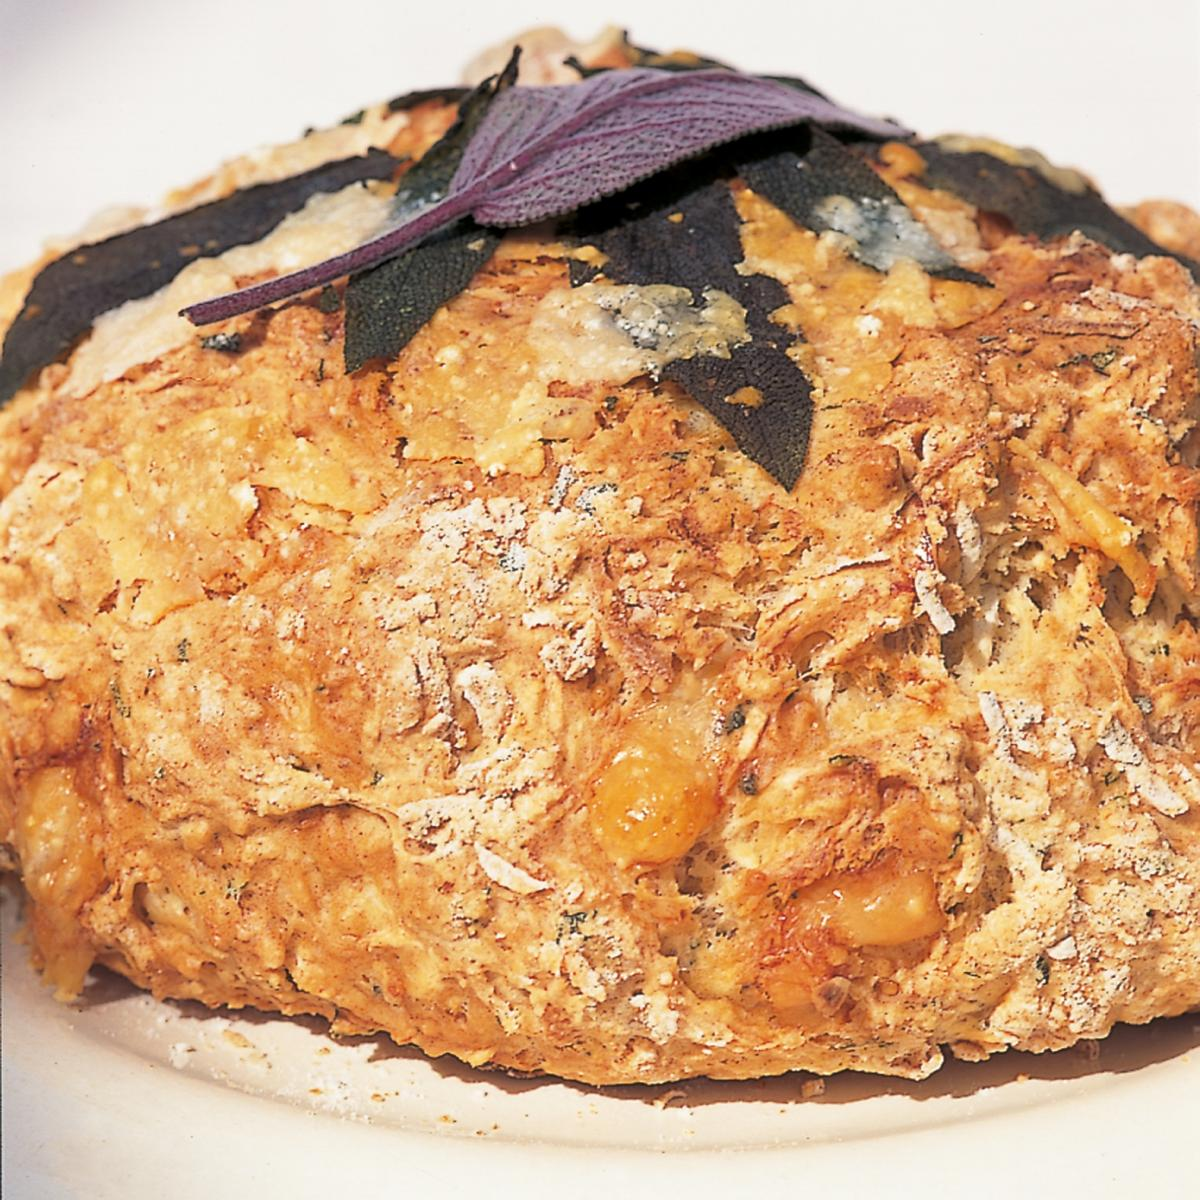 Htc parsnip parmesan and sage bread